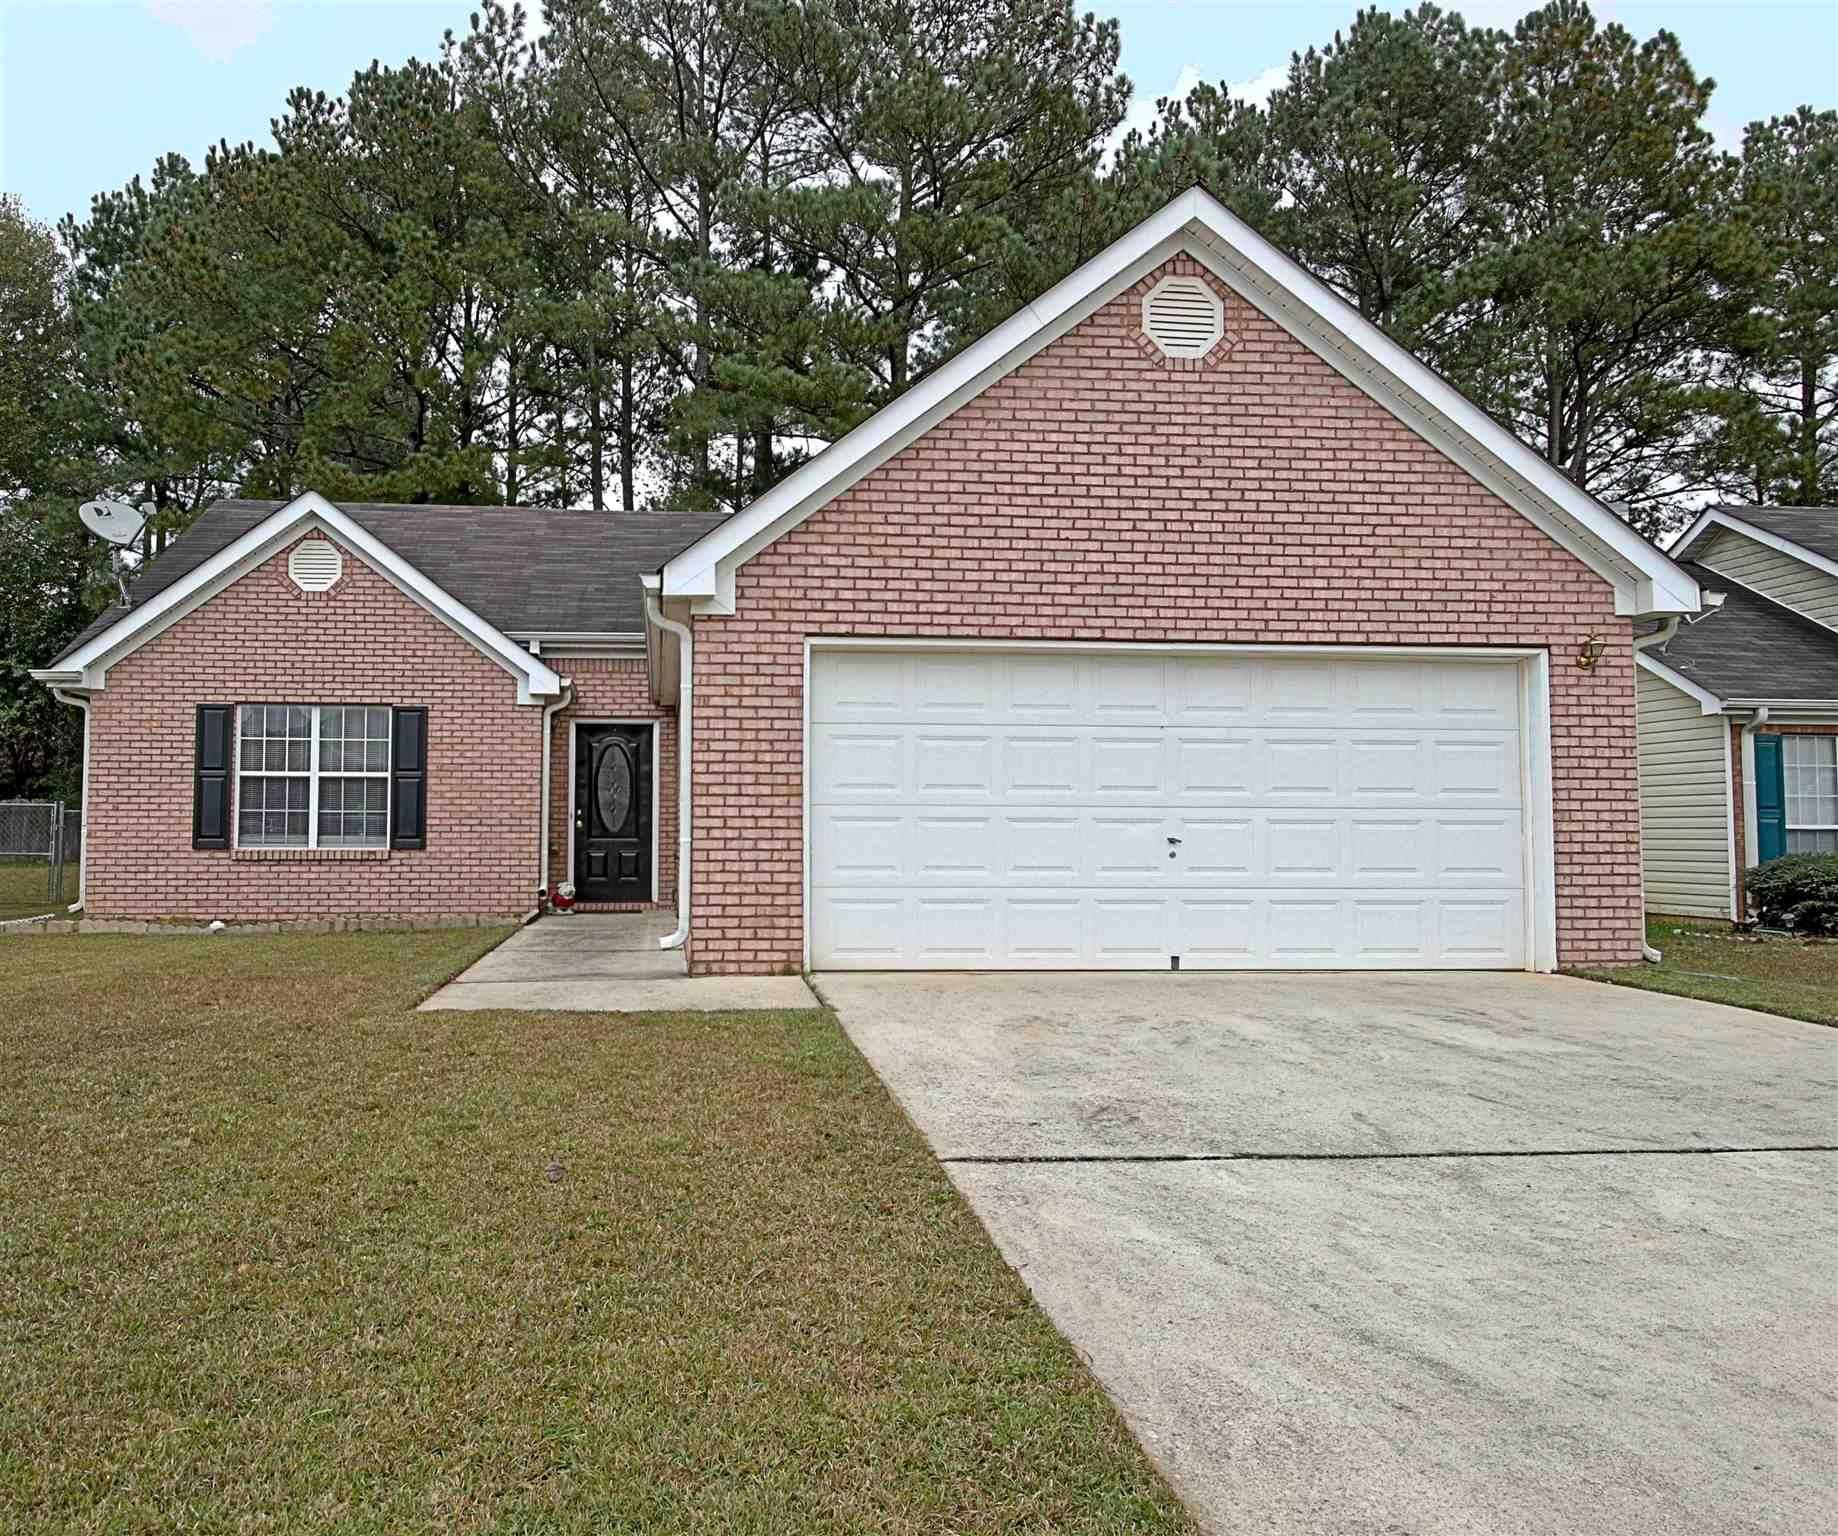 1645 Graystone Dr, Hampton, GA 30228 - MLS#: 8895617